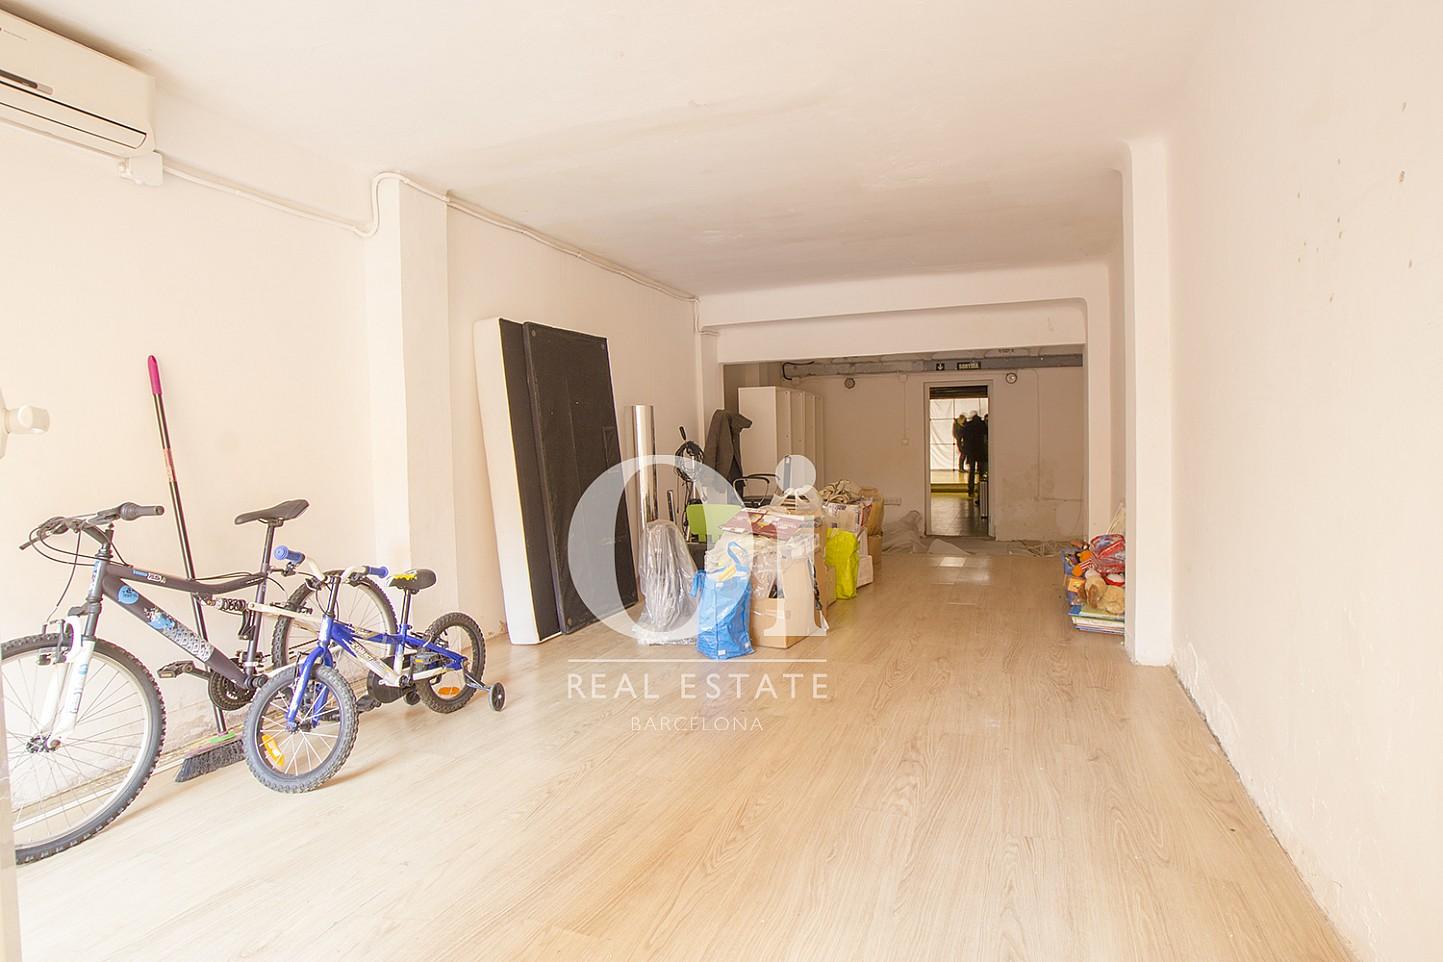 Fantastic duplex for sale in Poblenou, Barcelona